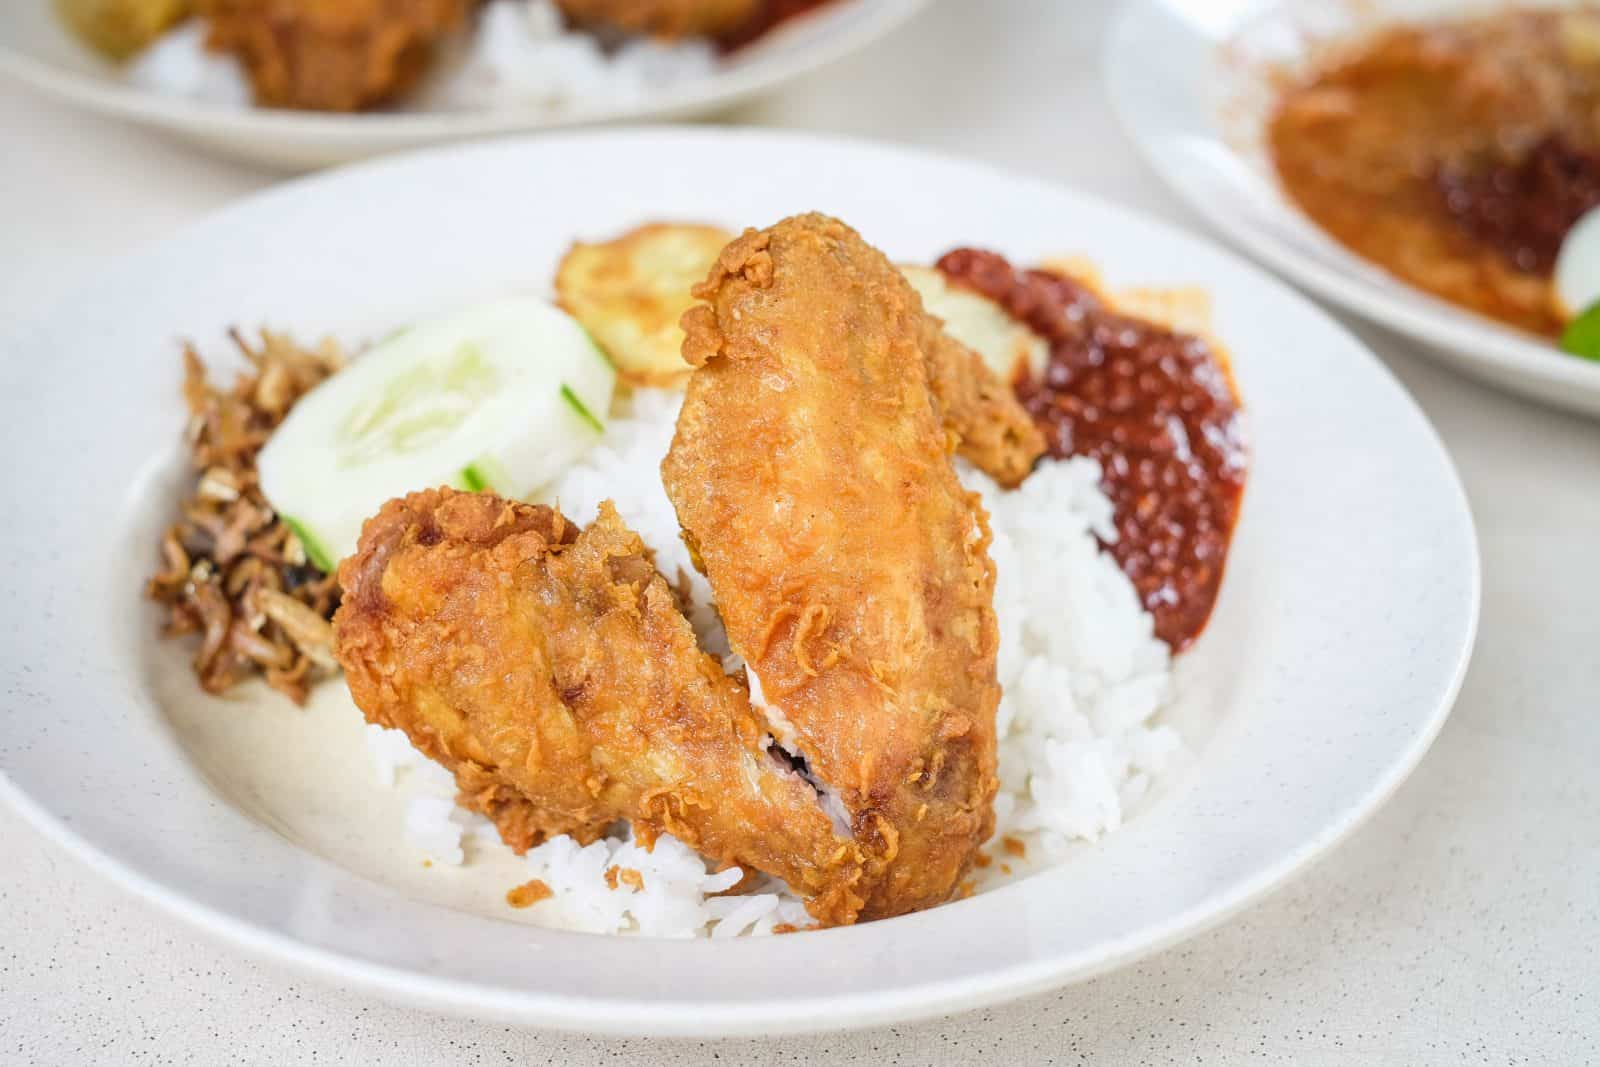 Chai Chee Nasi Lemak - Good Ol' Nasi Lemak in Hougang